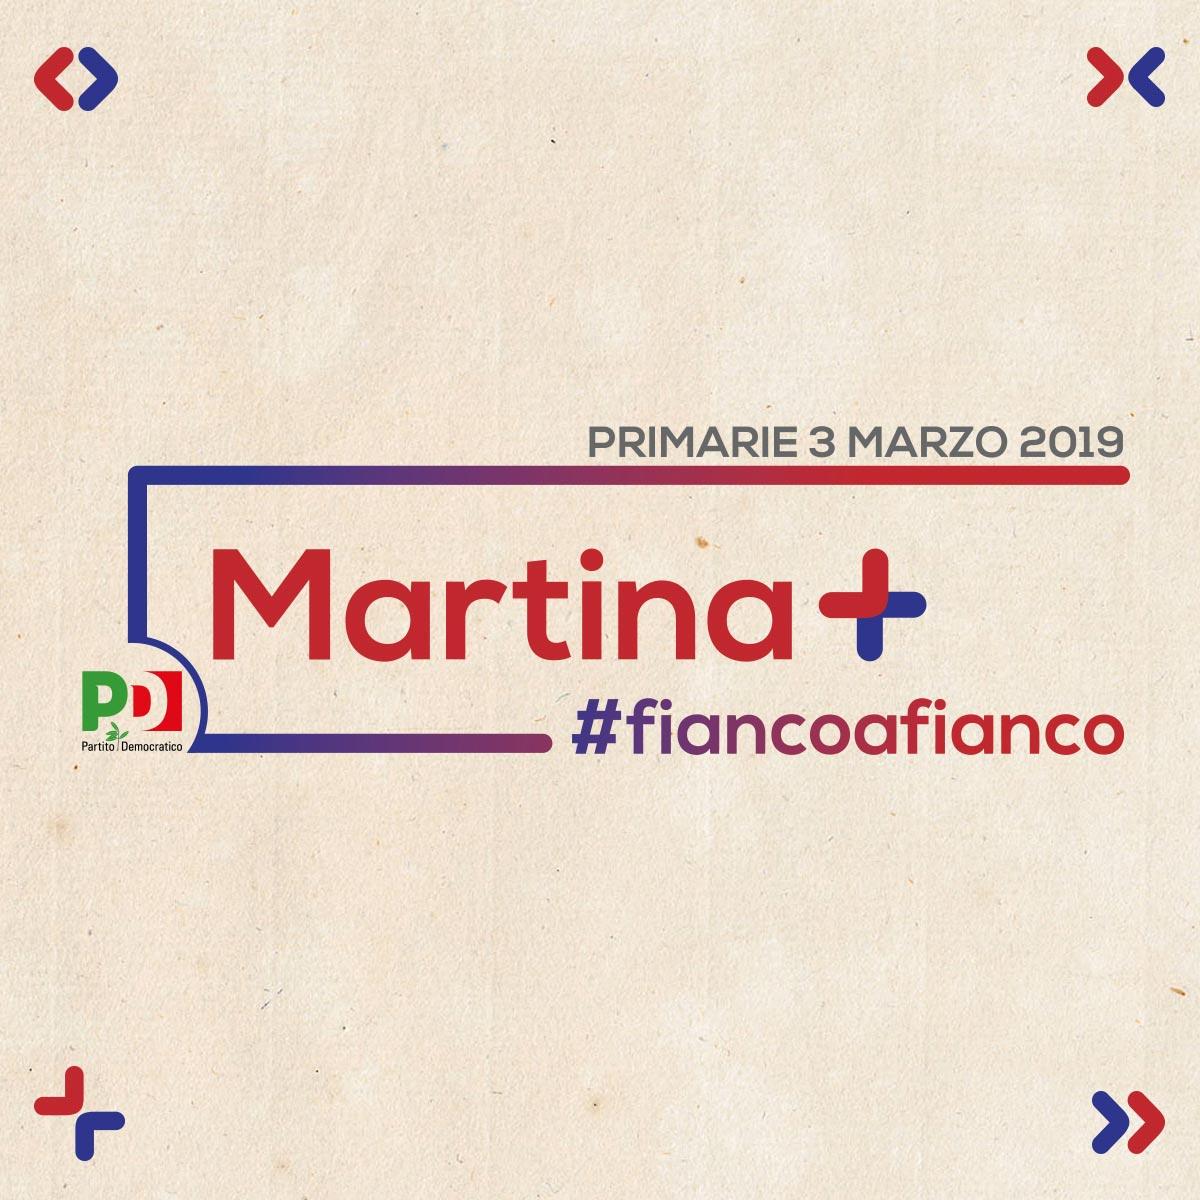 Martina-campagna2019-logo